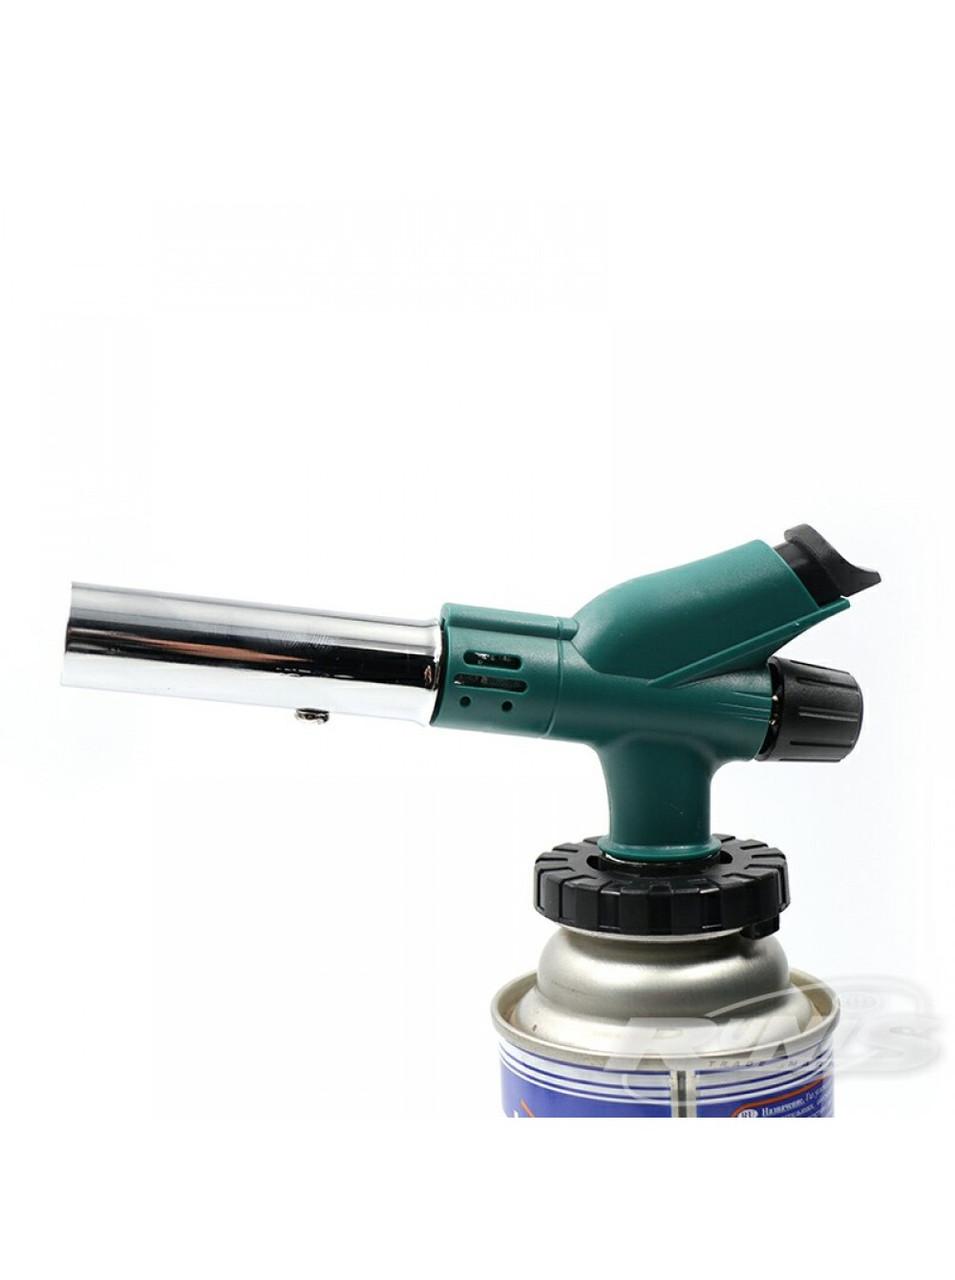 Газовая горелка RUNIS Premium P02, пьезо. (цанг.)/80/ арт. 4-044, (2038)